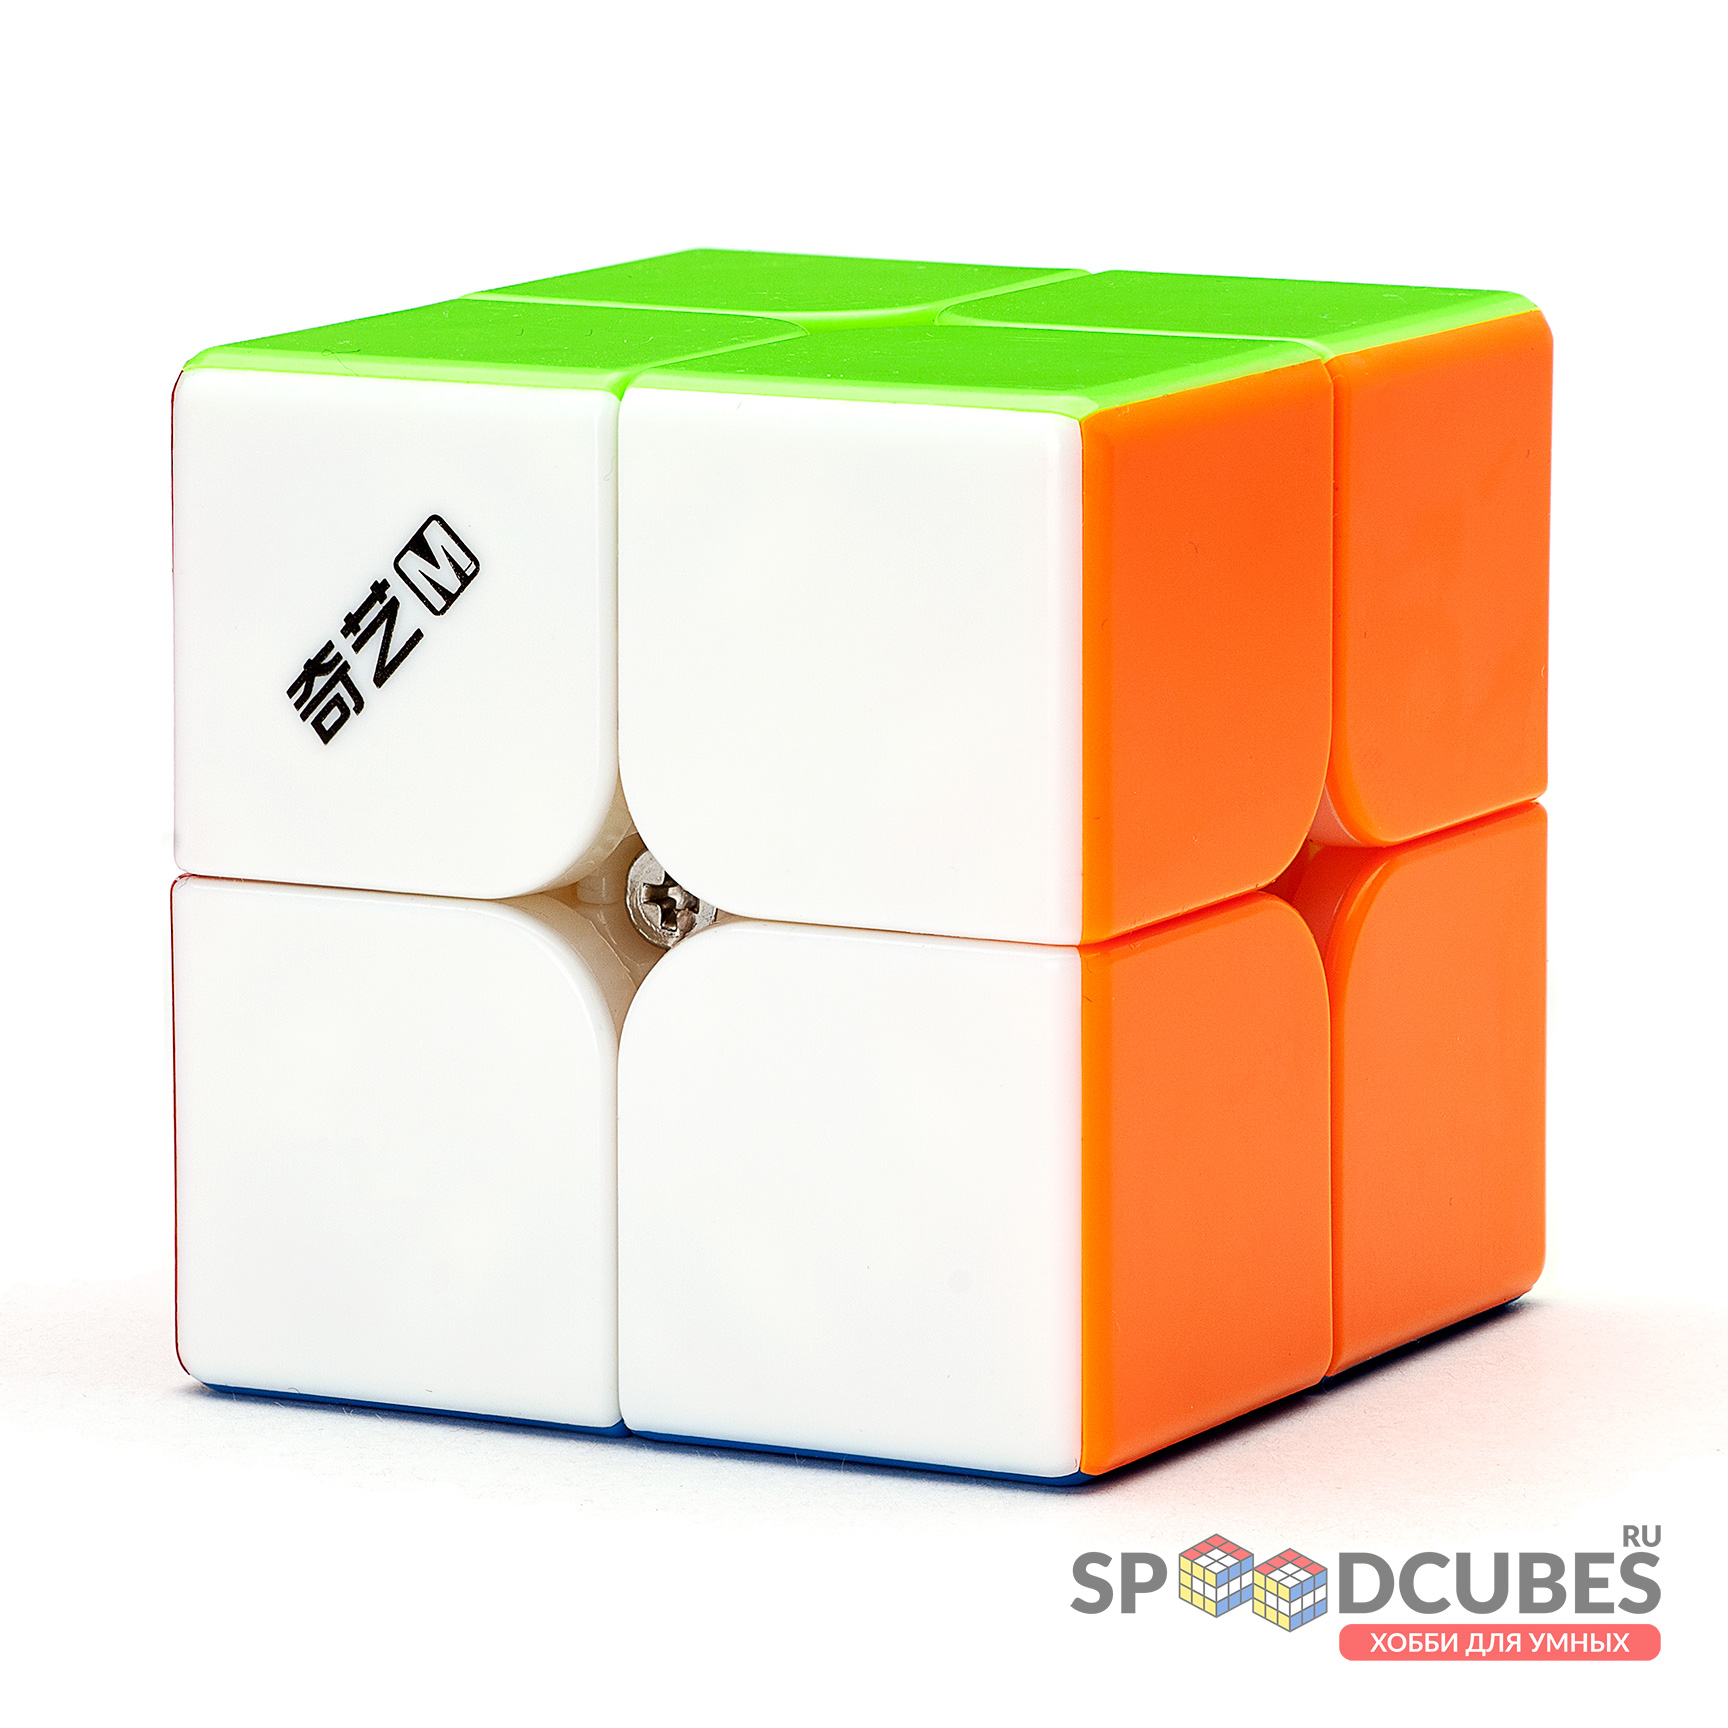 QiYi (MoFangGe) MS 2x2x2 Magnetic